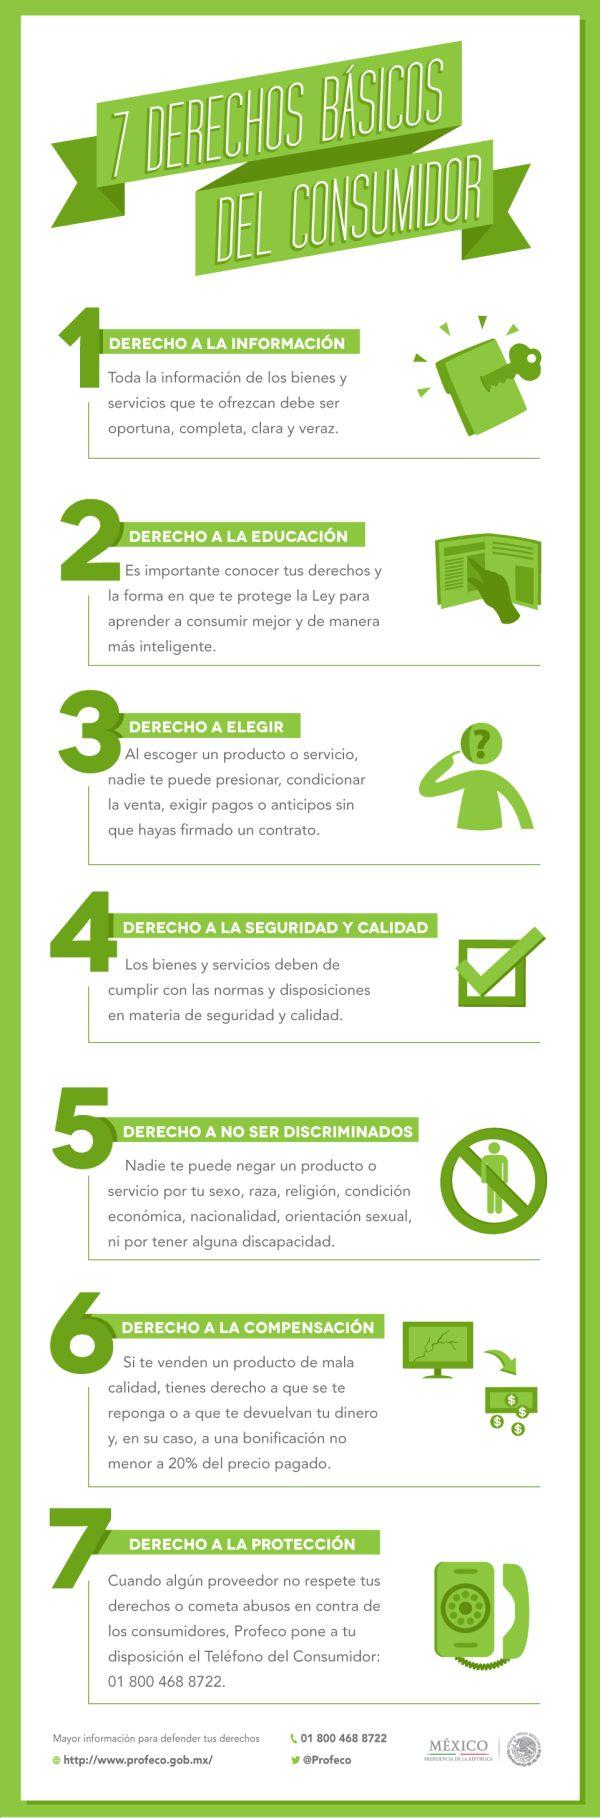 7 derechos básicos del consumidor en México @Profeco #infografia #infographic #marketing